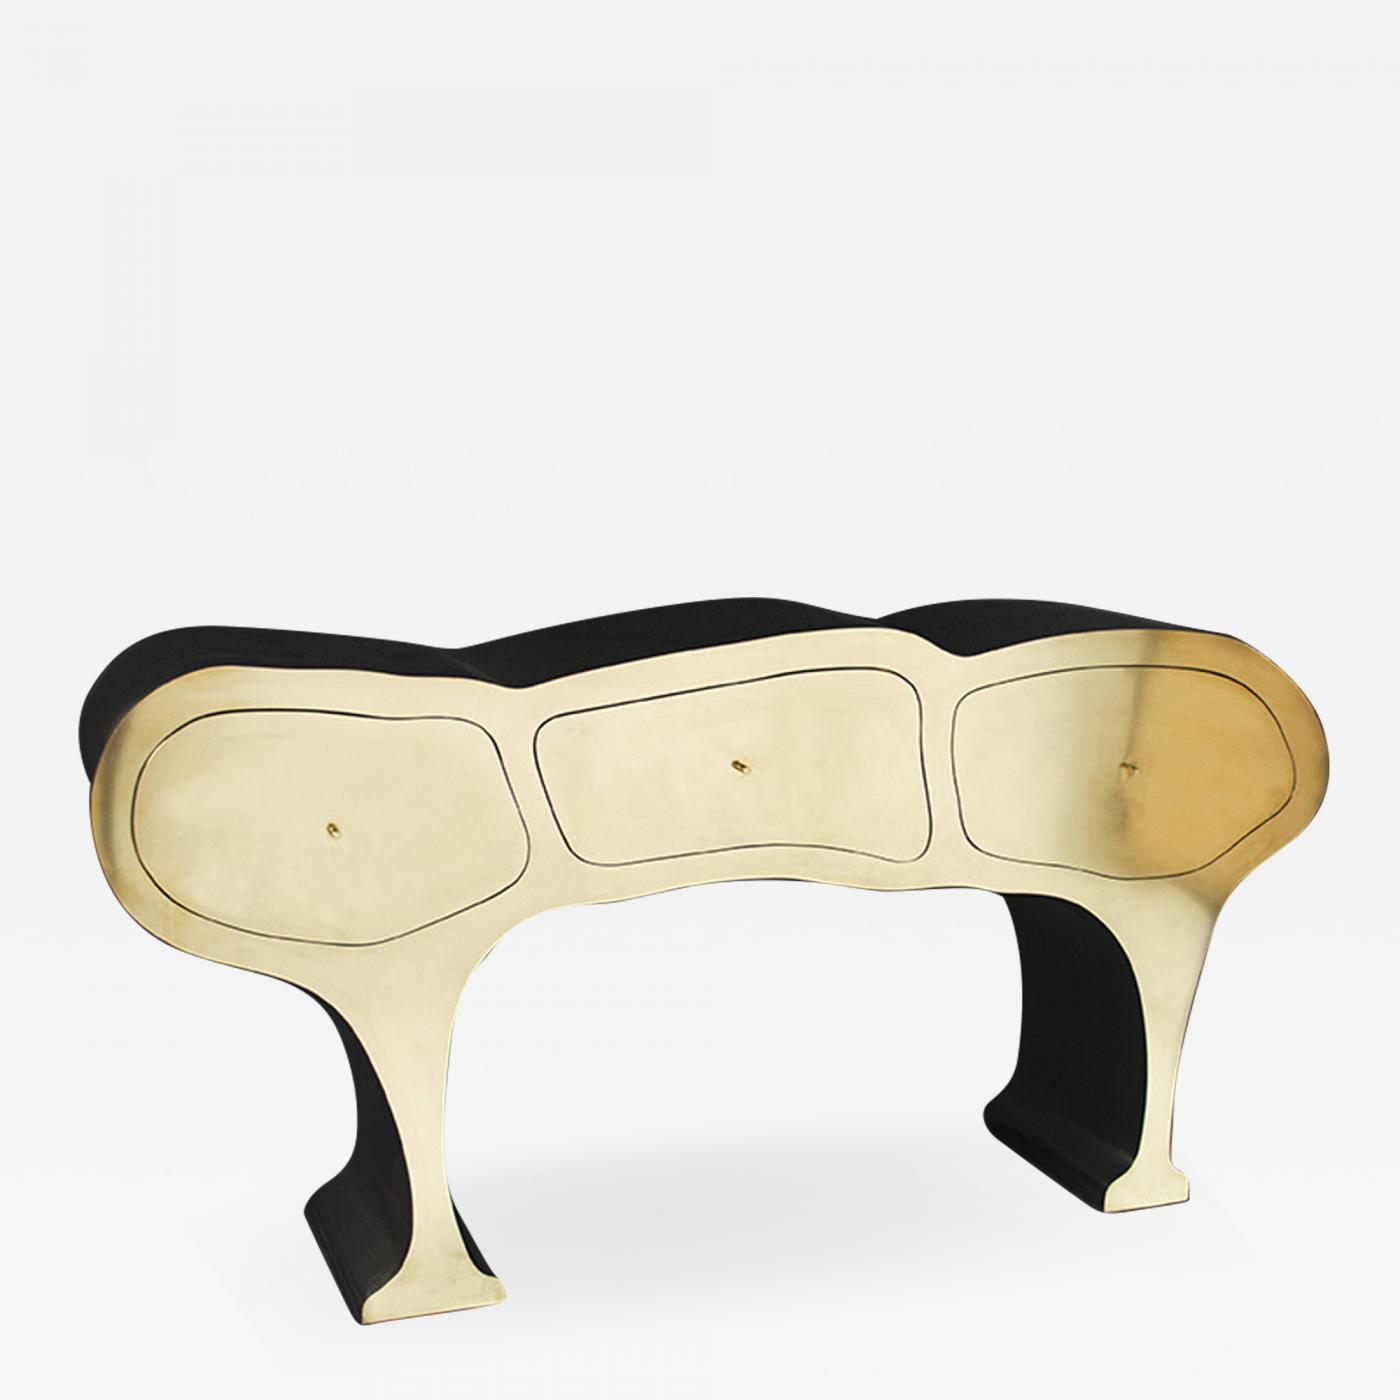 Groovy Werner Neumann Original Brass Cabinet Werner Neumann Creativecarmelina Interior Chair Design Creativecarmelinacom